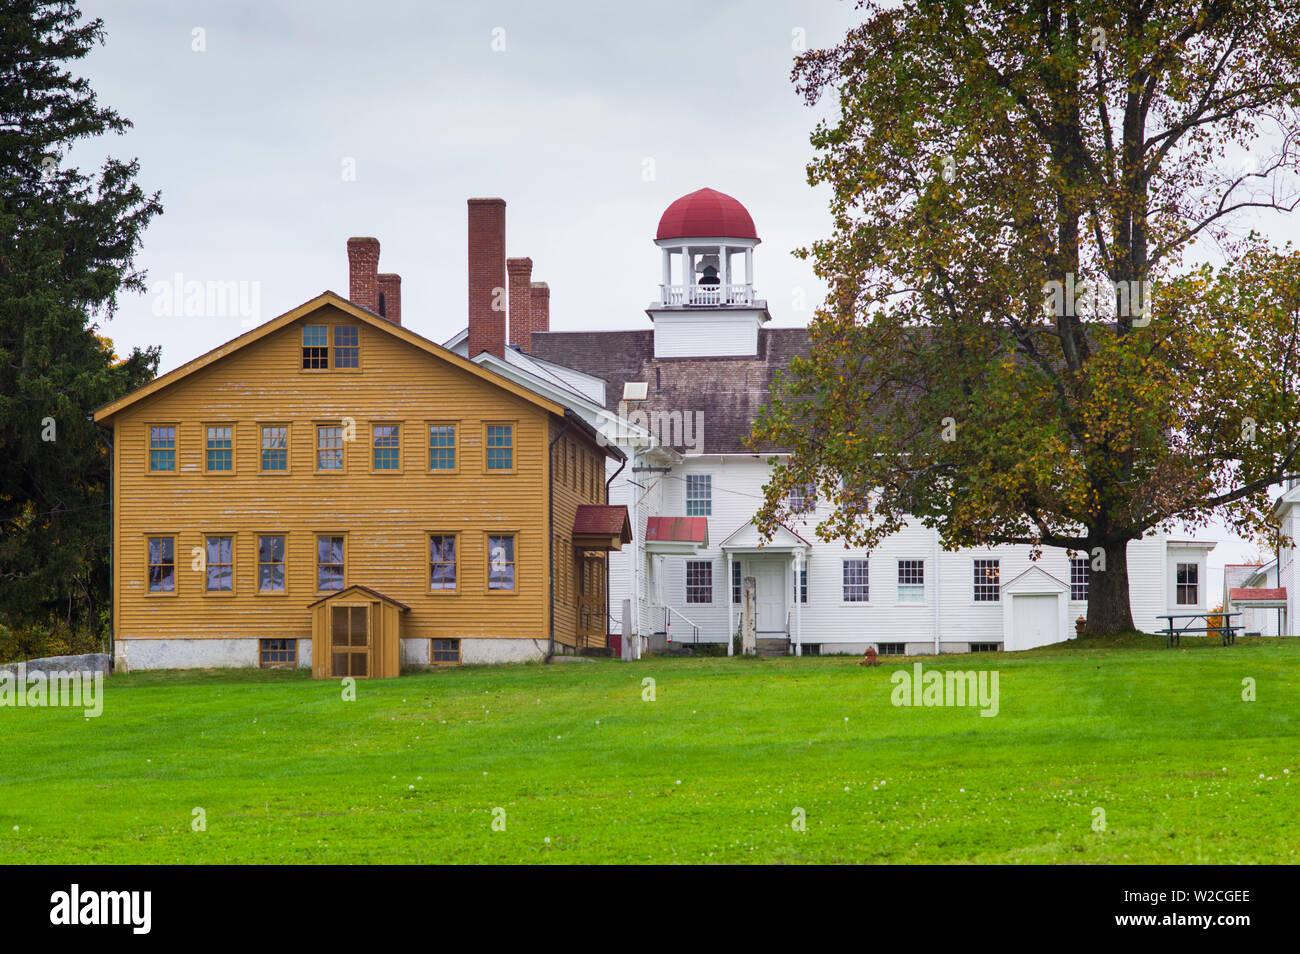 USA, New Hampshire, Canterbury, Canterbury Shaker Village, former Shaker religious community, buildings Stock Photo